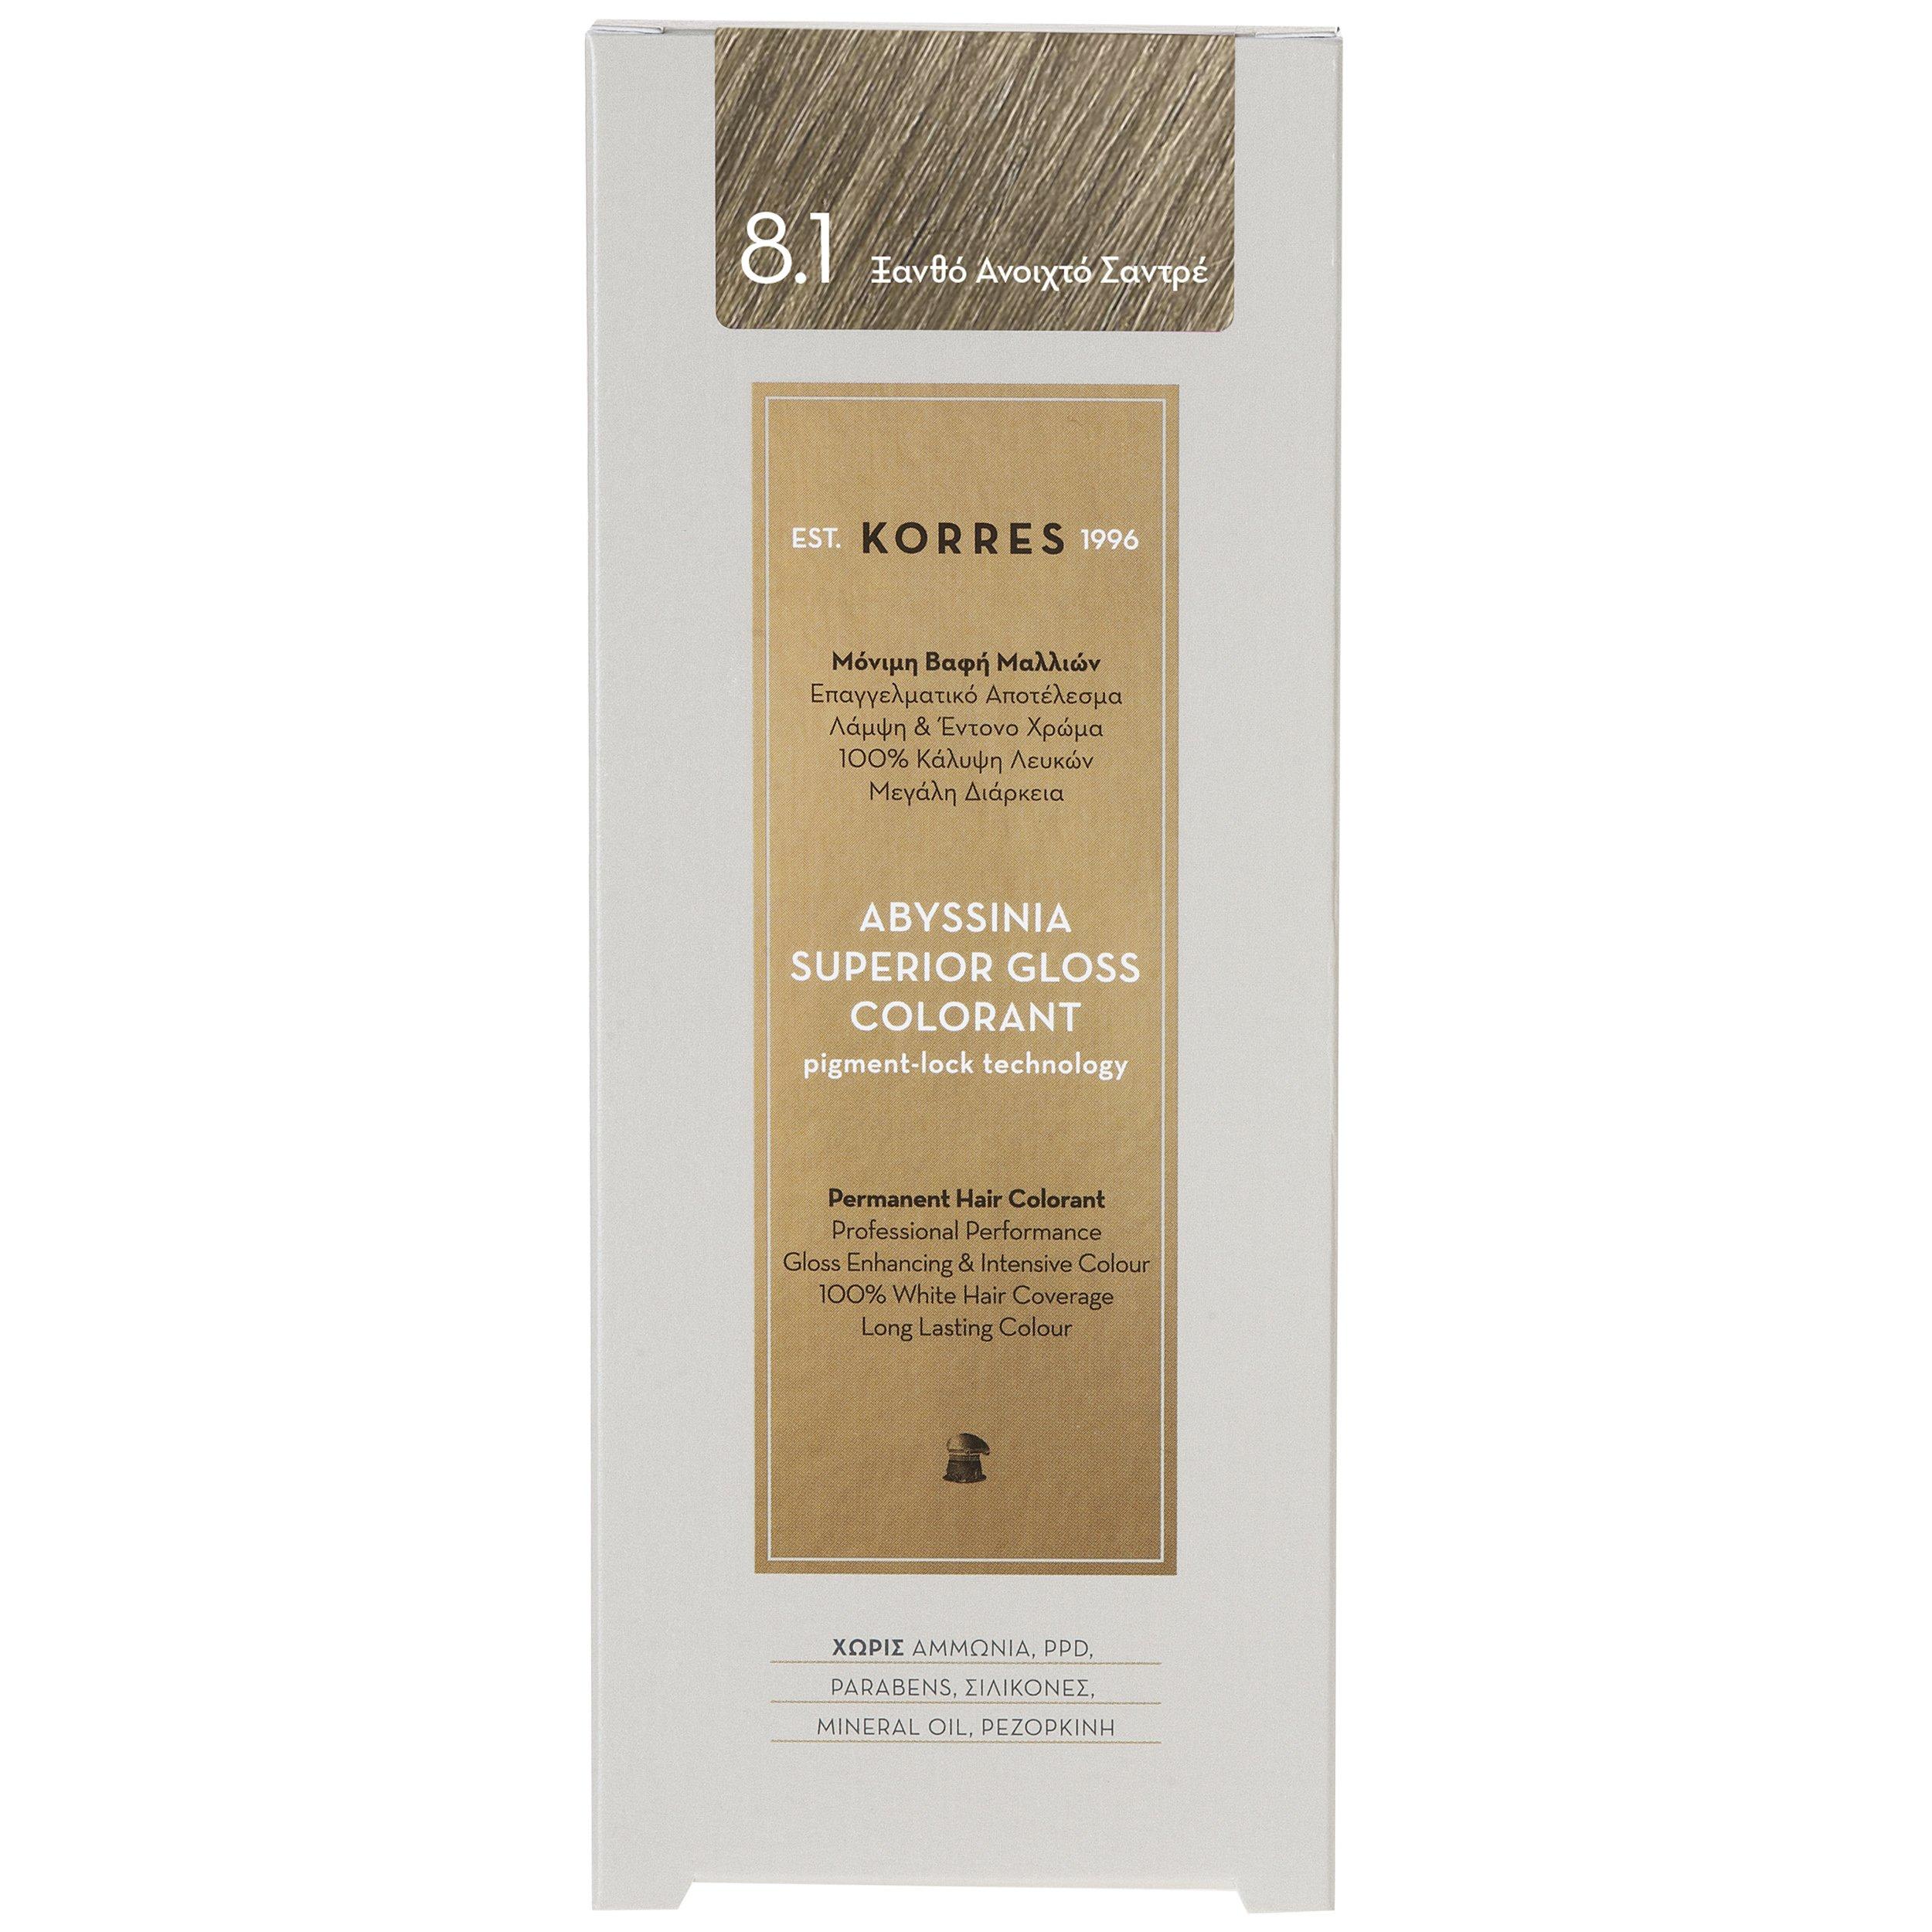 Korres Abyssinia Superior Gloss Colorant Επαγγελματικό Αποτέλεσμα Λάμψη & Έντονο Χρώμα – 8.1 ΞΑΝΘΟ ΑΝΟΙΚΤΟ ΣΑΝΤΡΕ